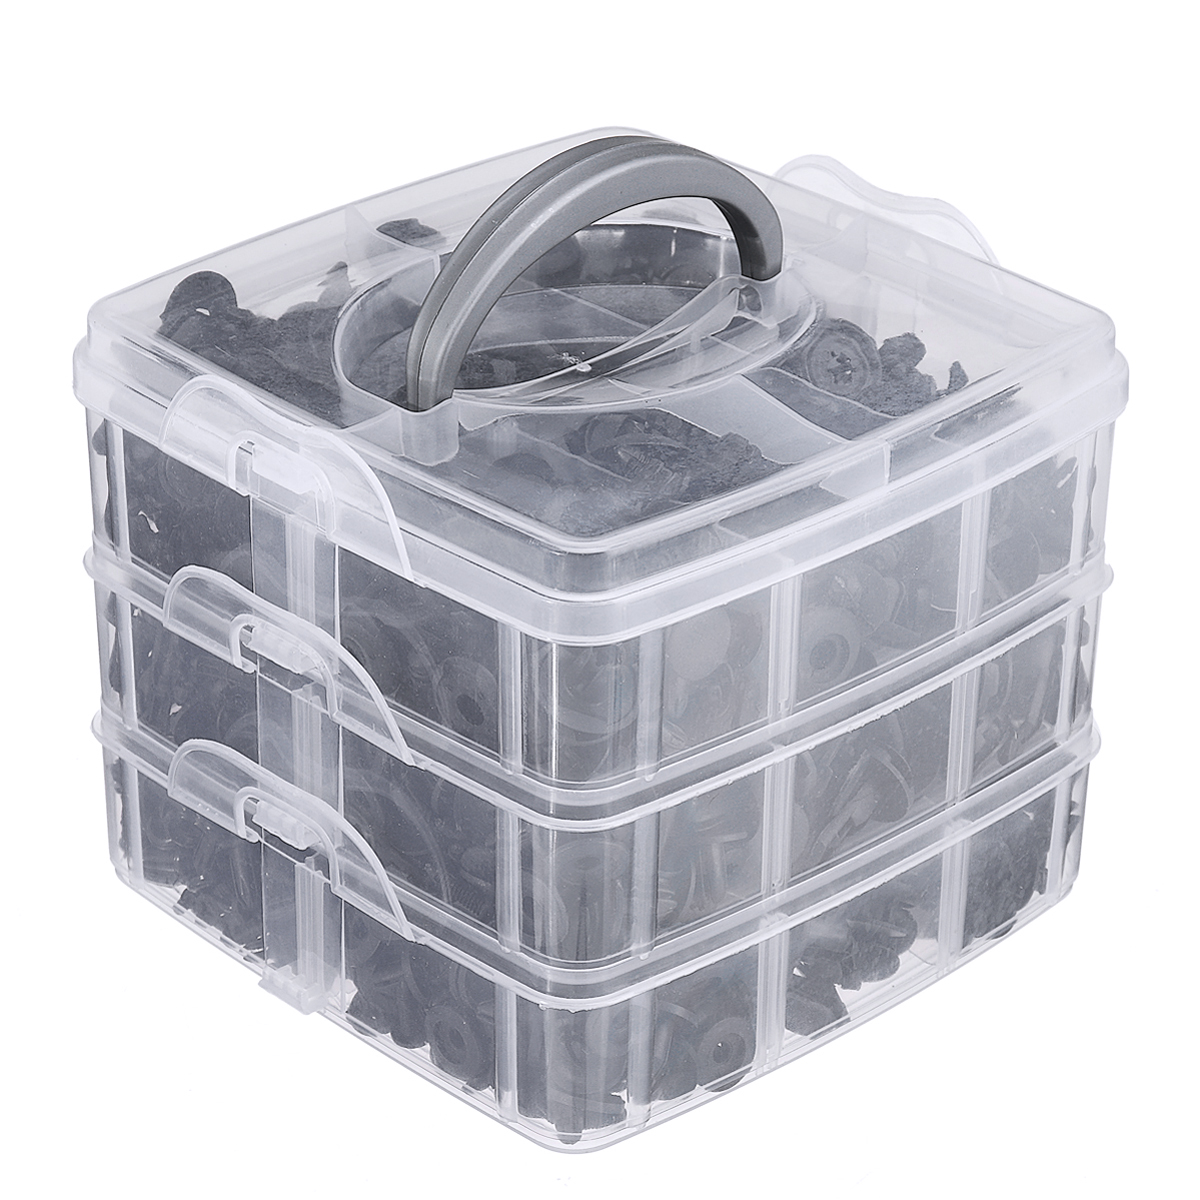 630 pcs 16 Kinds Plastic Car Body Push Pin Rivet Fastener Trim Moulding Clip Fastener Clip Kit